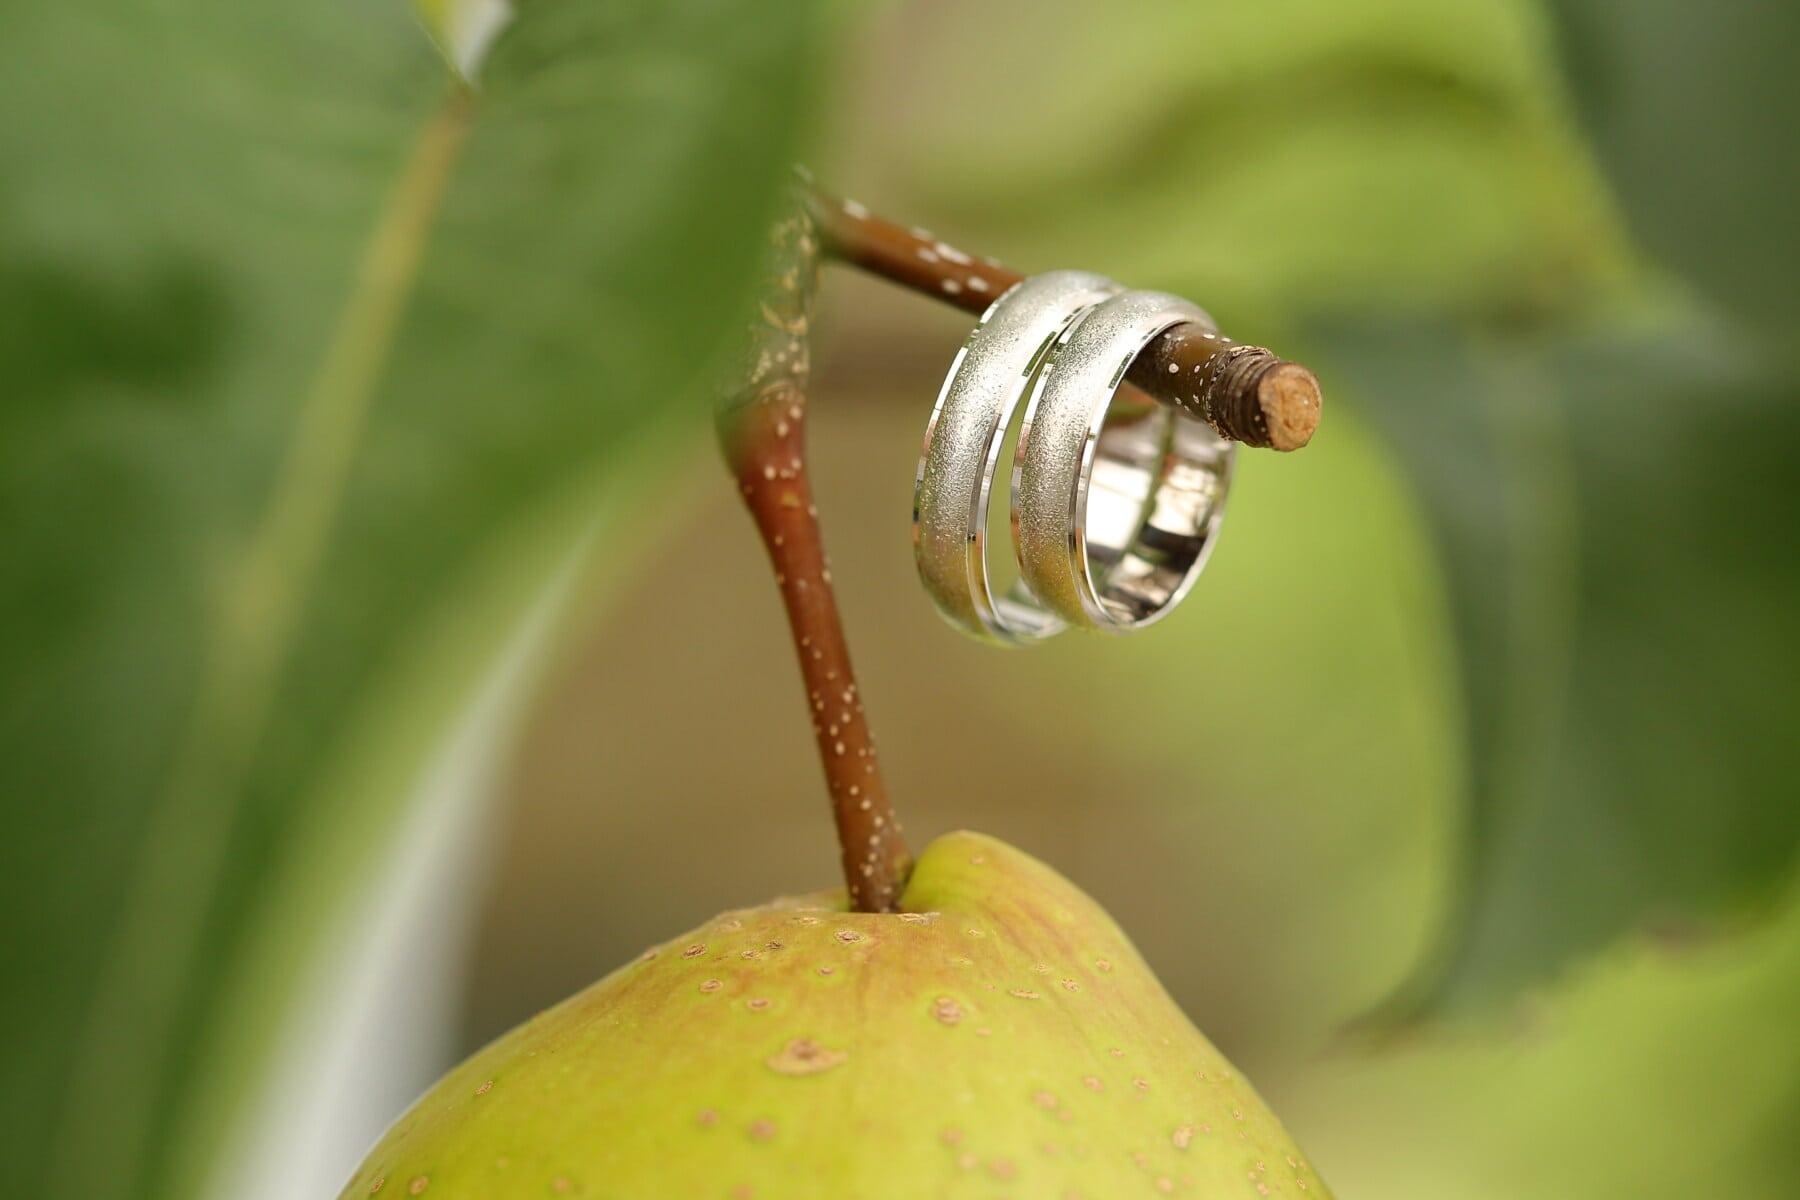 PEAR, bijoux, arbre fruitier, anneaux, brindille, fermer, feuille, nature, fruits, brouiller